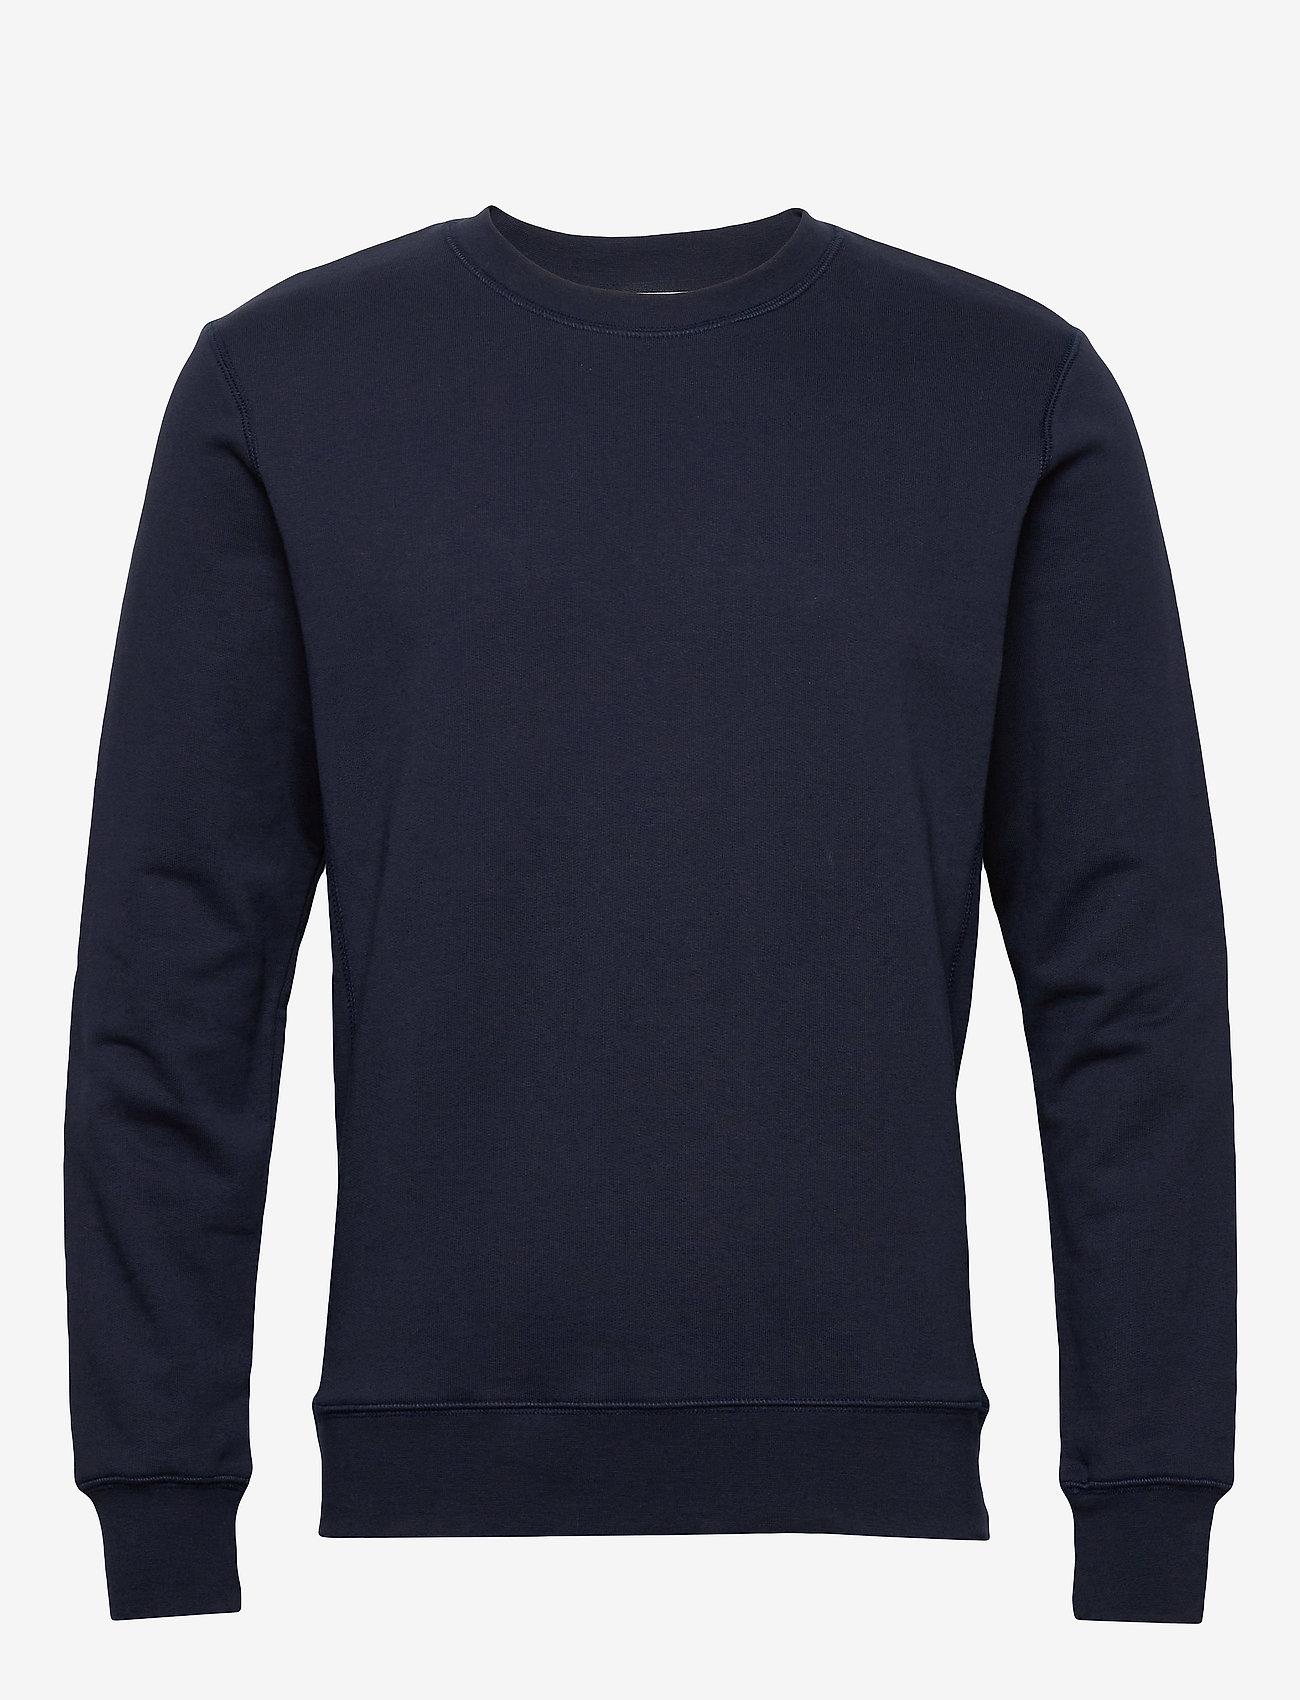 By Garment Makers The Organic Sweatshirt - Sweatshirts NAVY BLAZER - Menn Klær